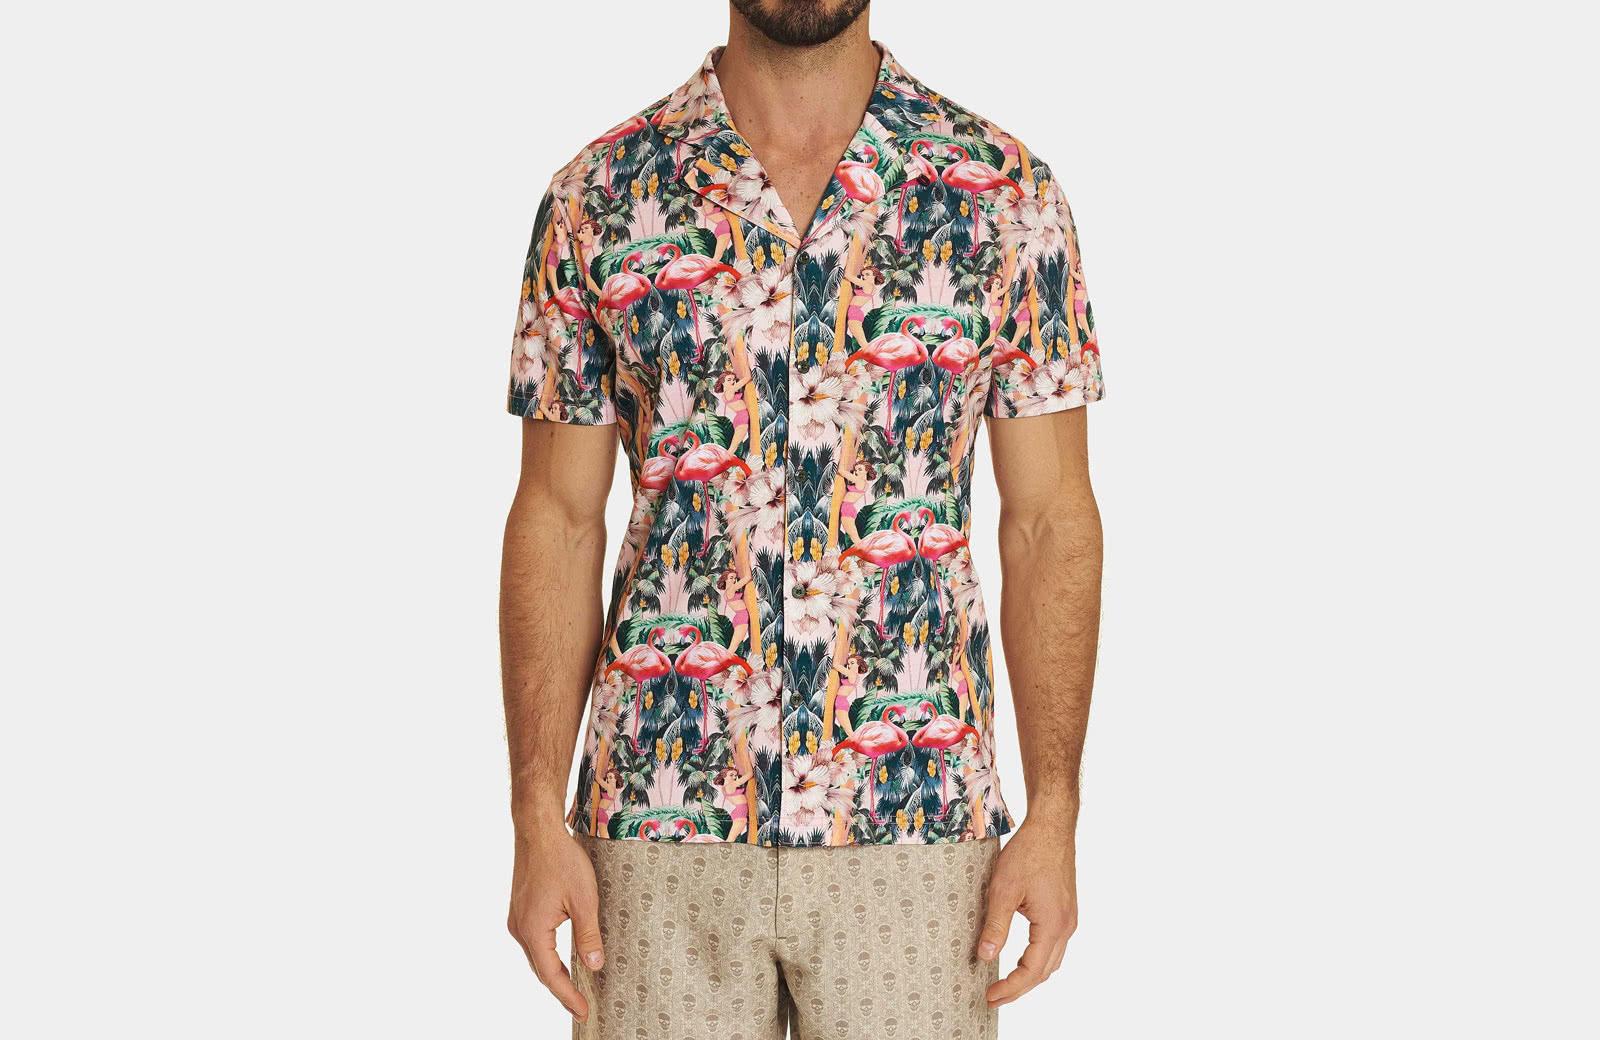 Robert Graham best men summer designer short sleeve shirt flamingo - Luxe Digital